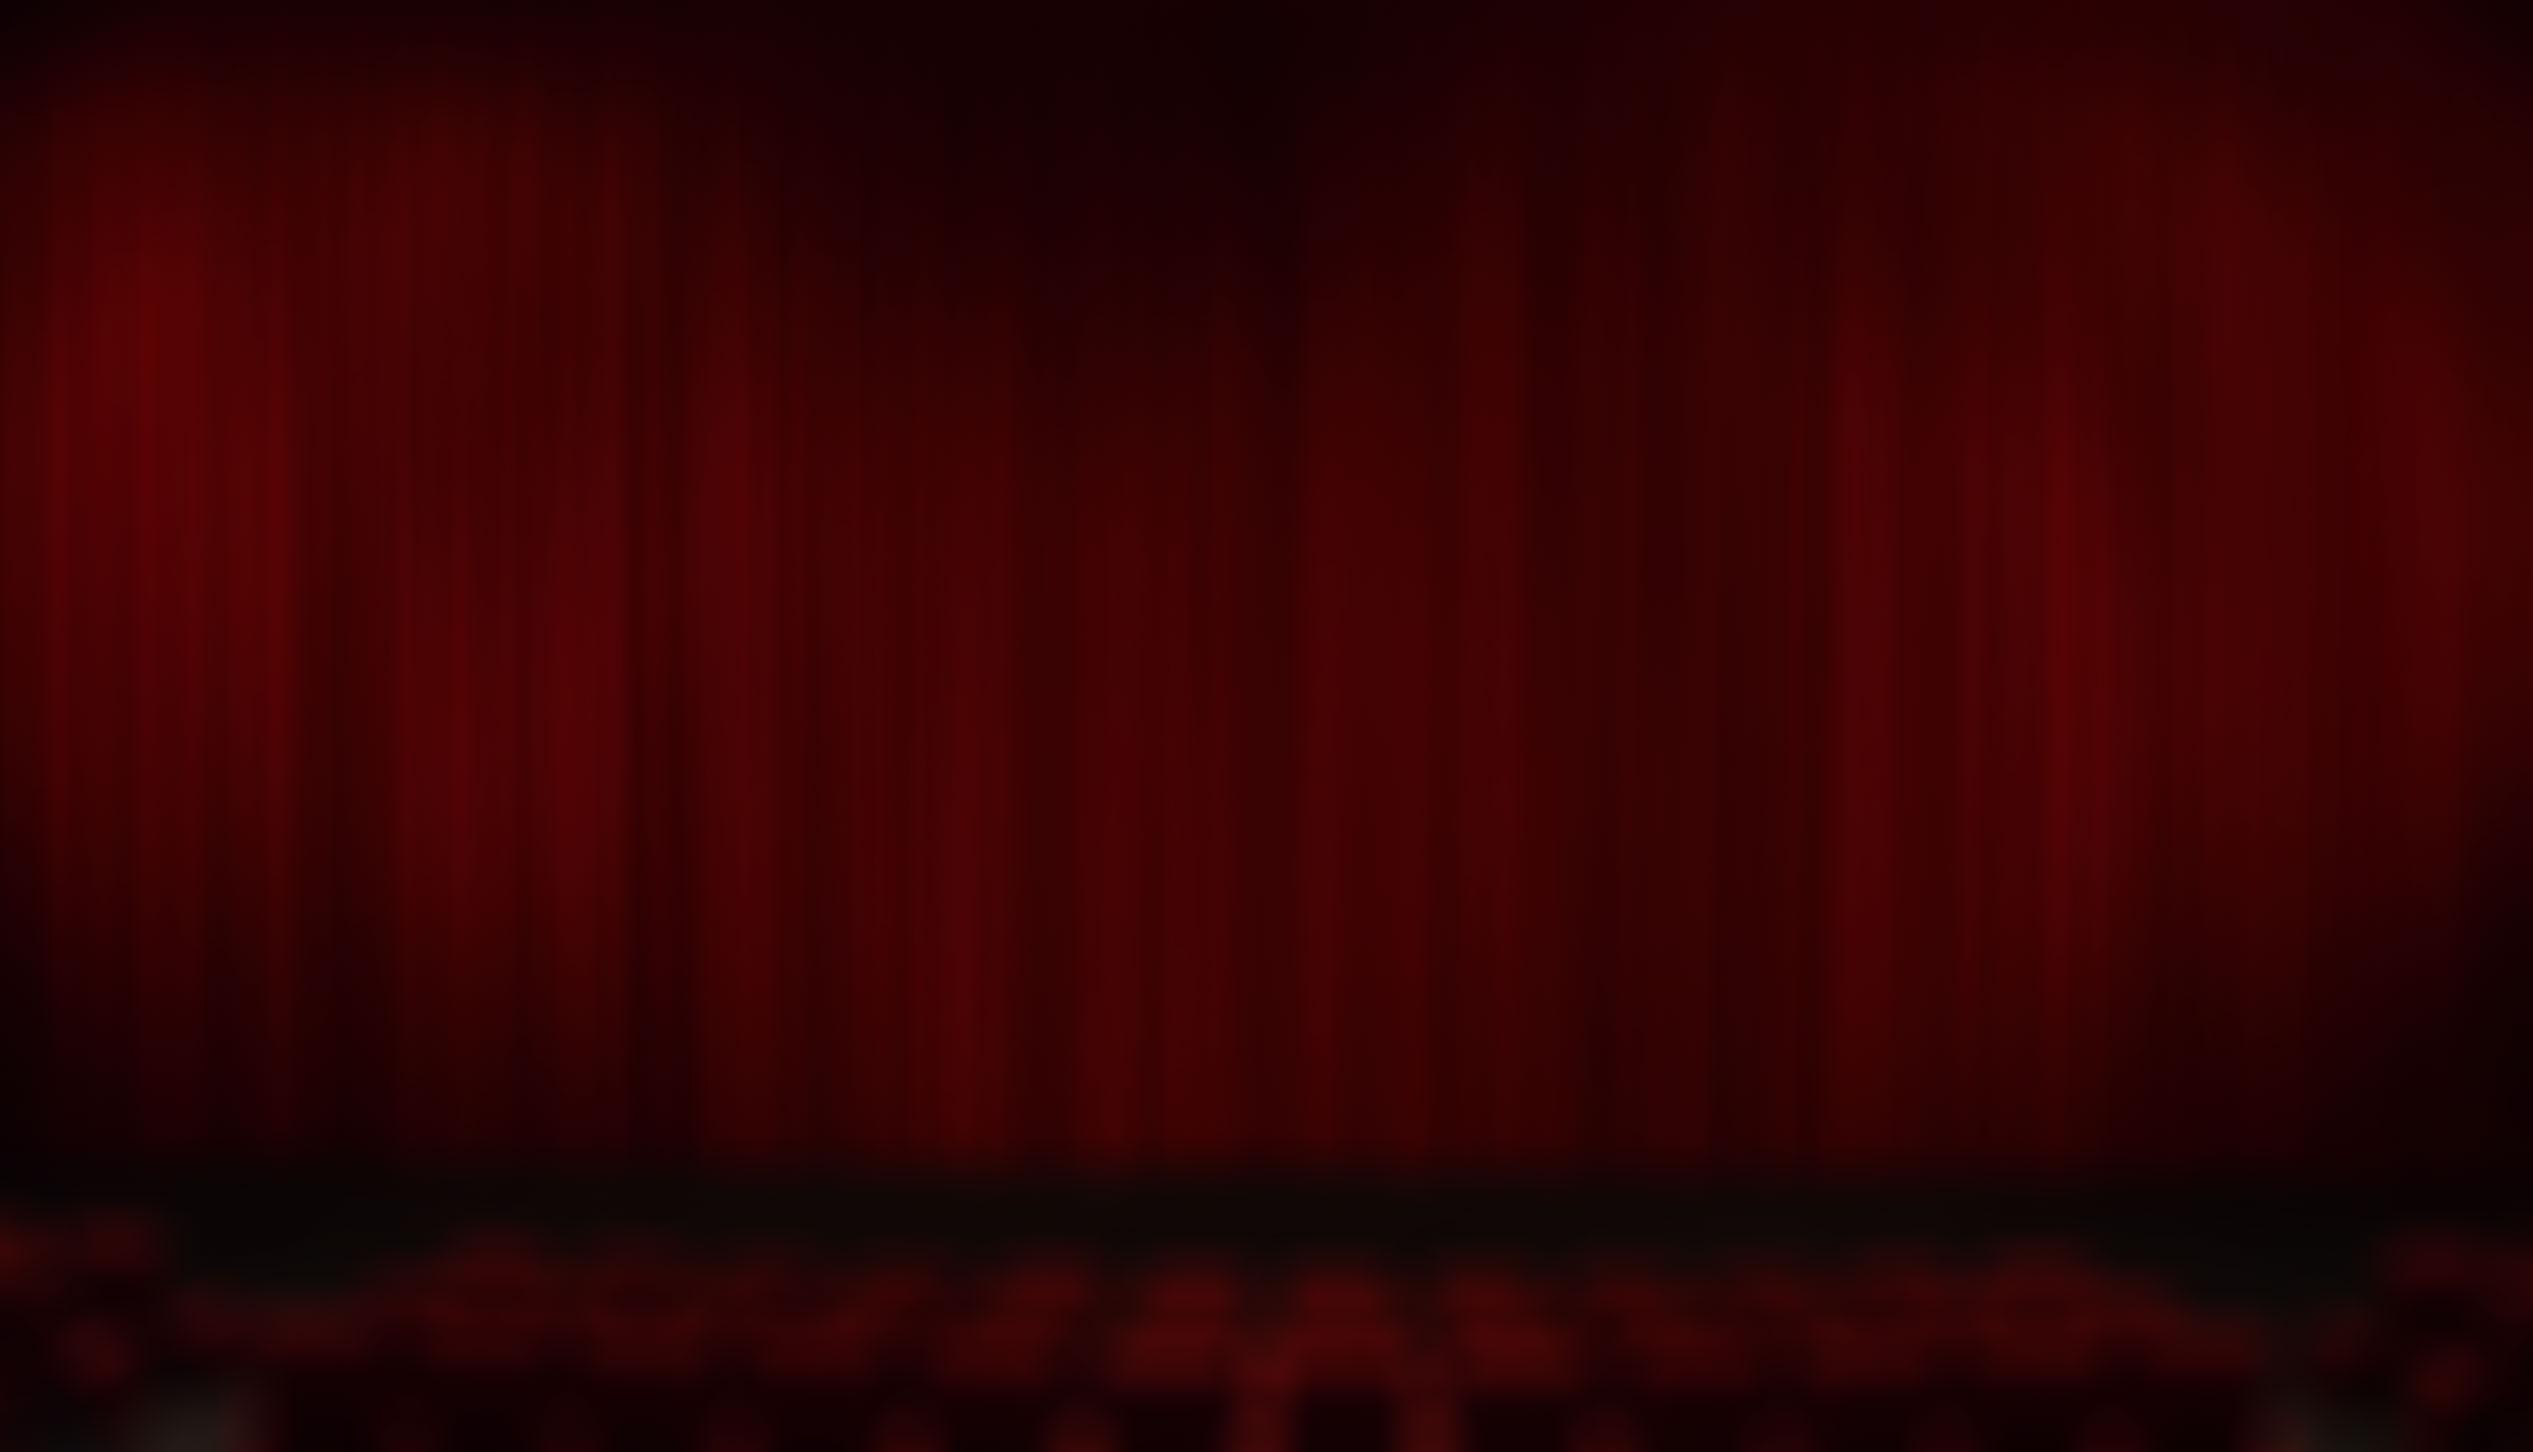 Black theatre curtain - Background Image Of Theatre Curtain